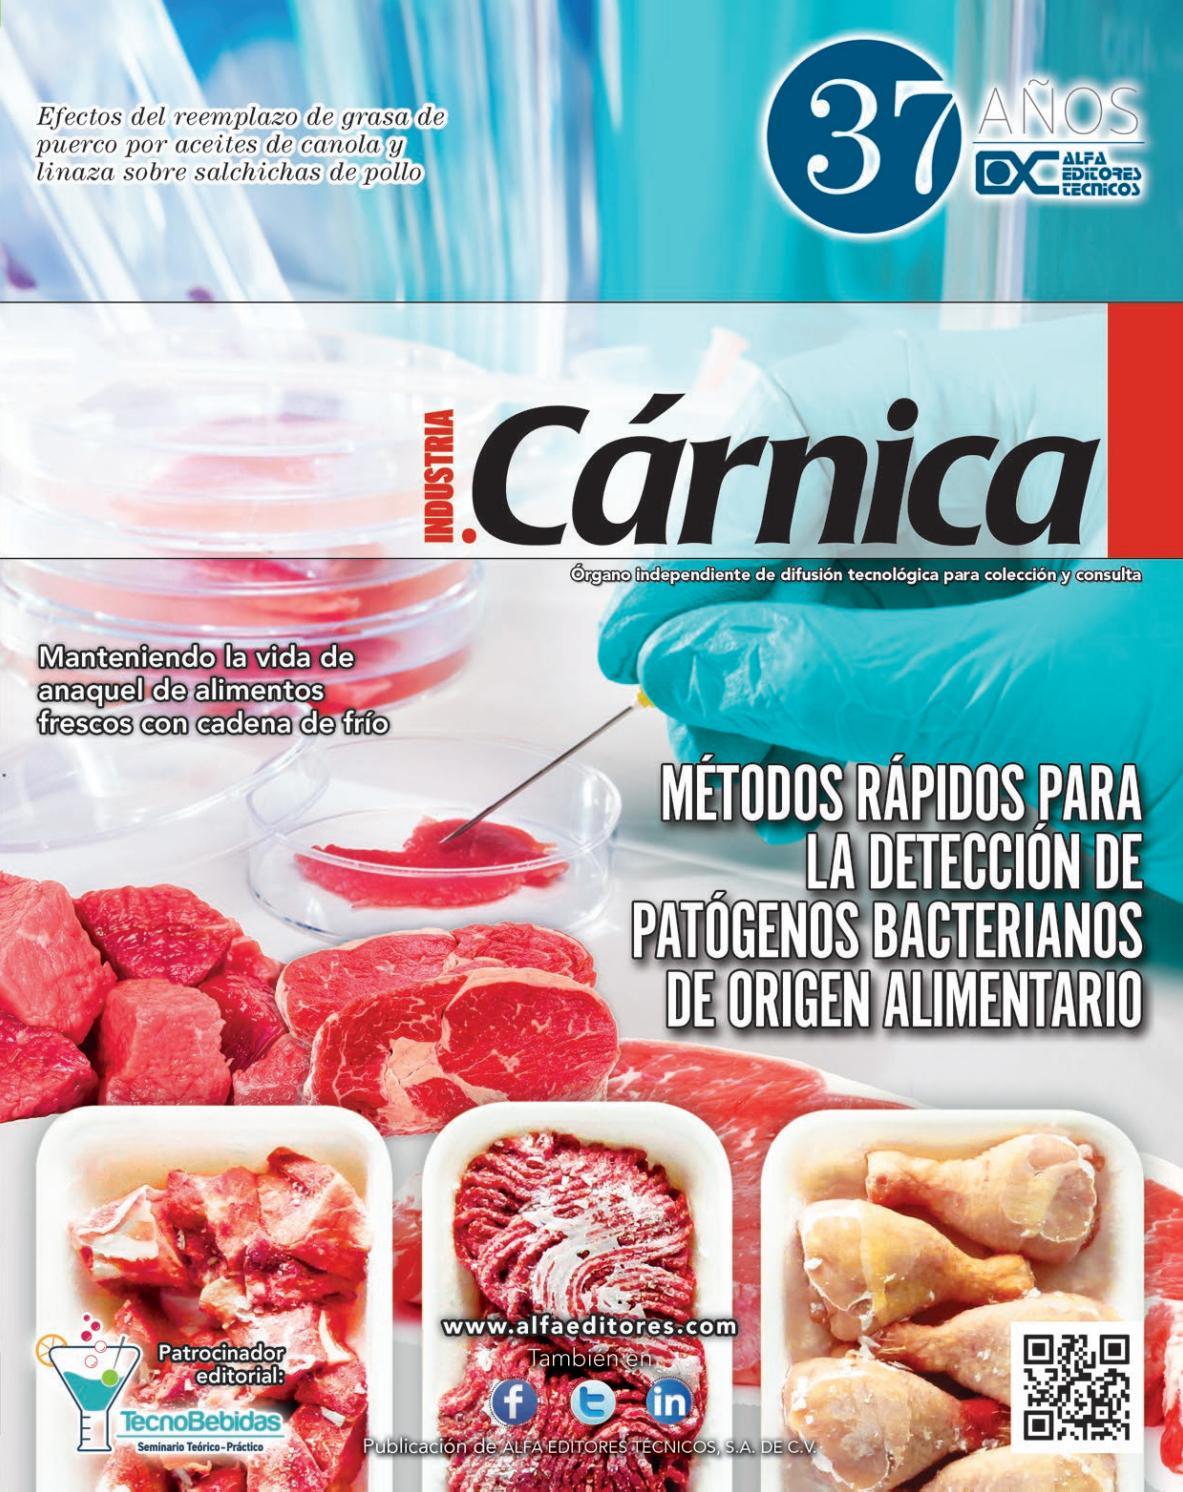 Industria Cárnica agosto-septiembre 2016 by Alfa Editores Técnicos - issuu 254bf3ce5a9